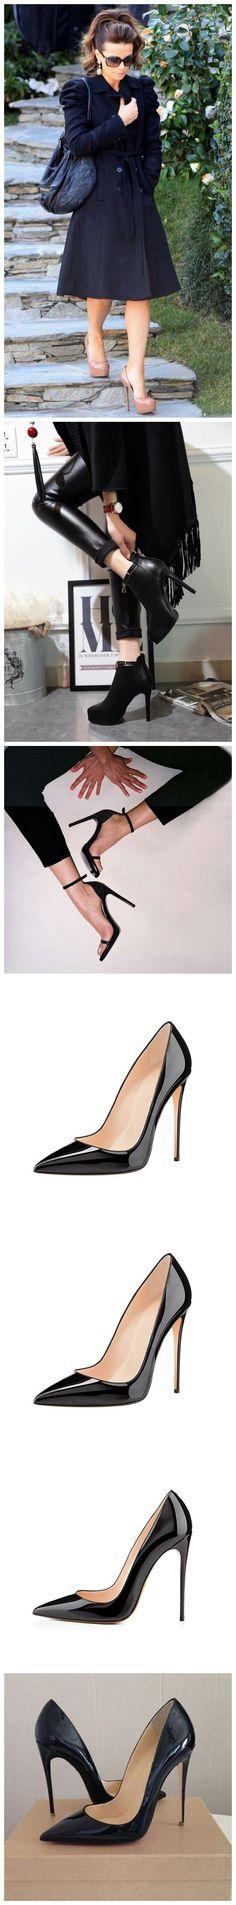 2019 High Heels, Womens Pointed Toe Slip on Stilettos Party Wedding Pumps Basic Shoes Black Wedding Pumps, Elegant Lady, Walk On, Black Shoes, Kitten Heels, High Heels, Slip On, Comfy, Luxury